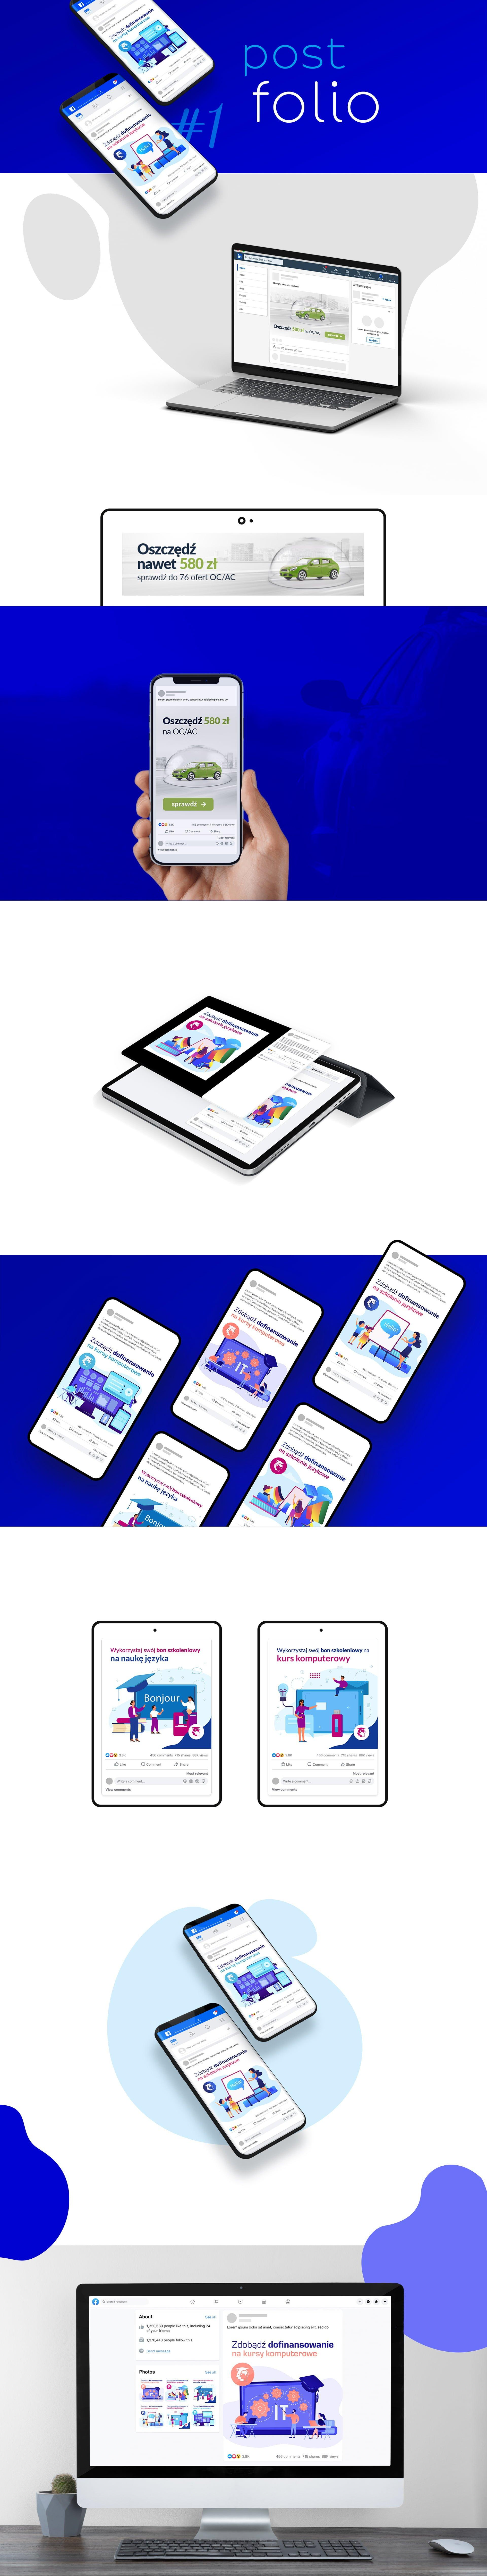 Portfolio of social media posts shown on computer, smartphone, tablet.